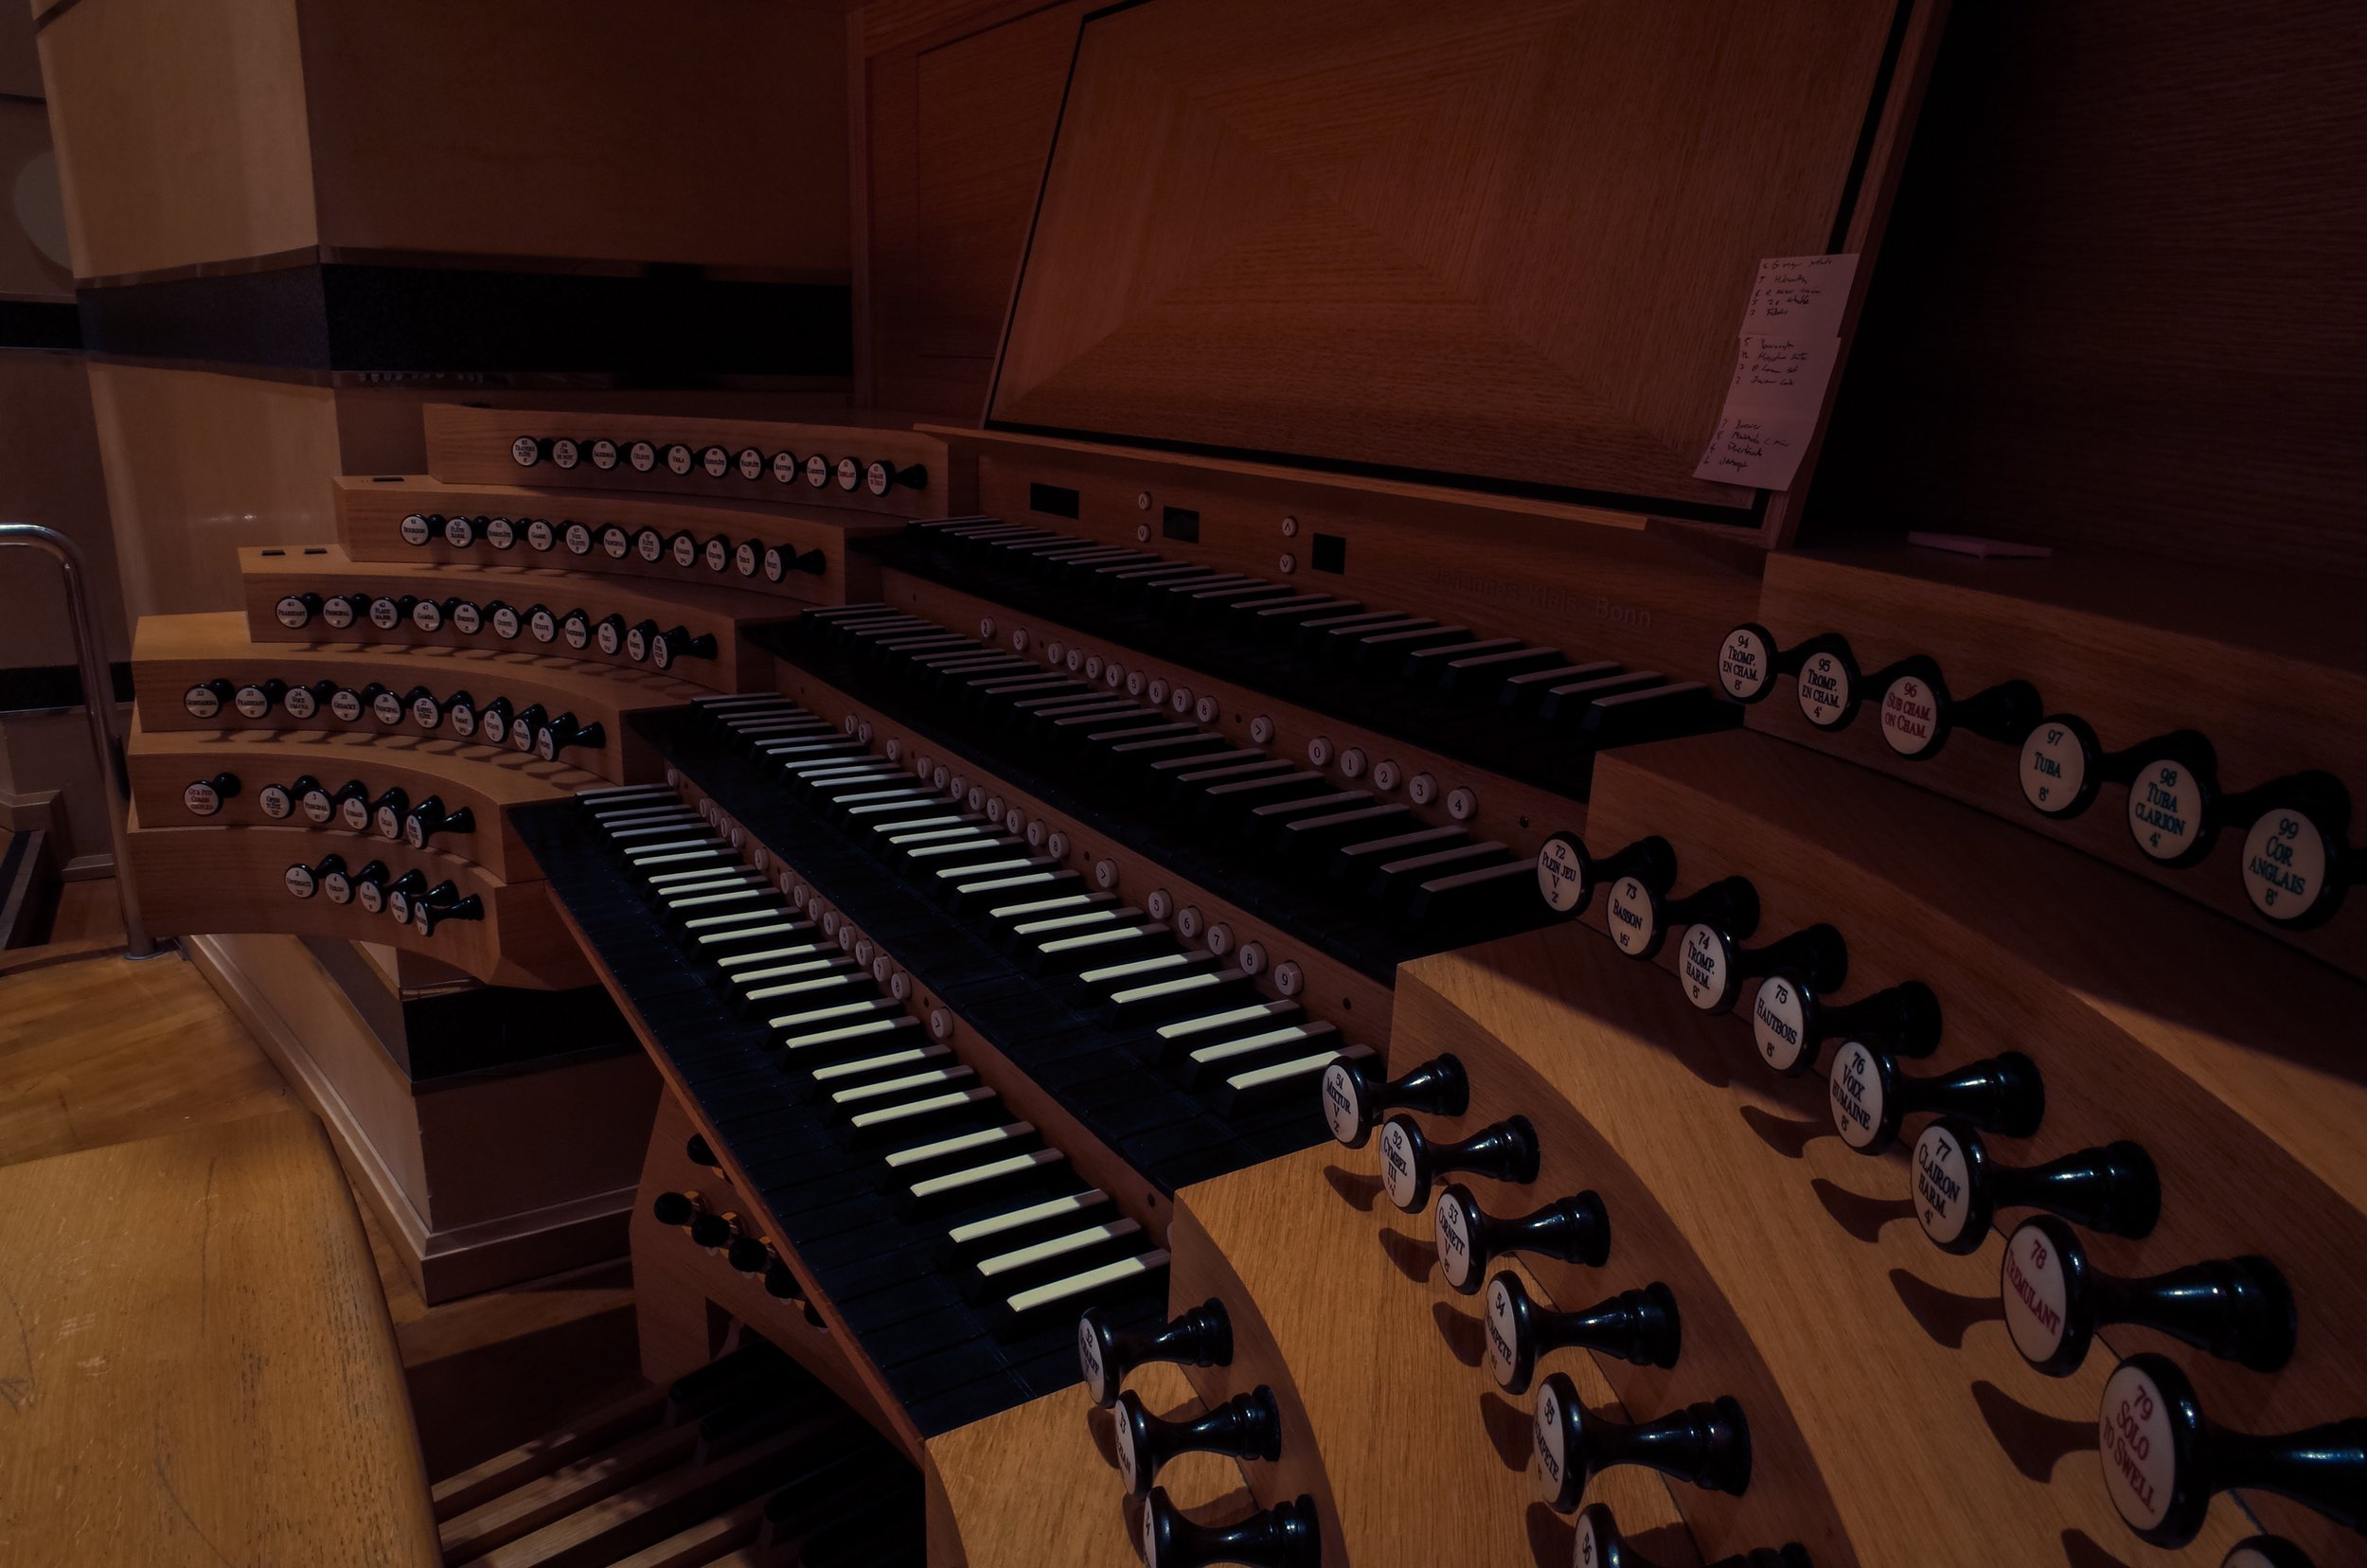 6000-Pipe Symphony Organ